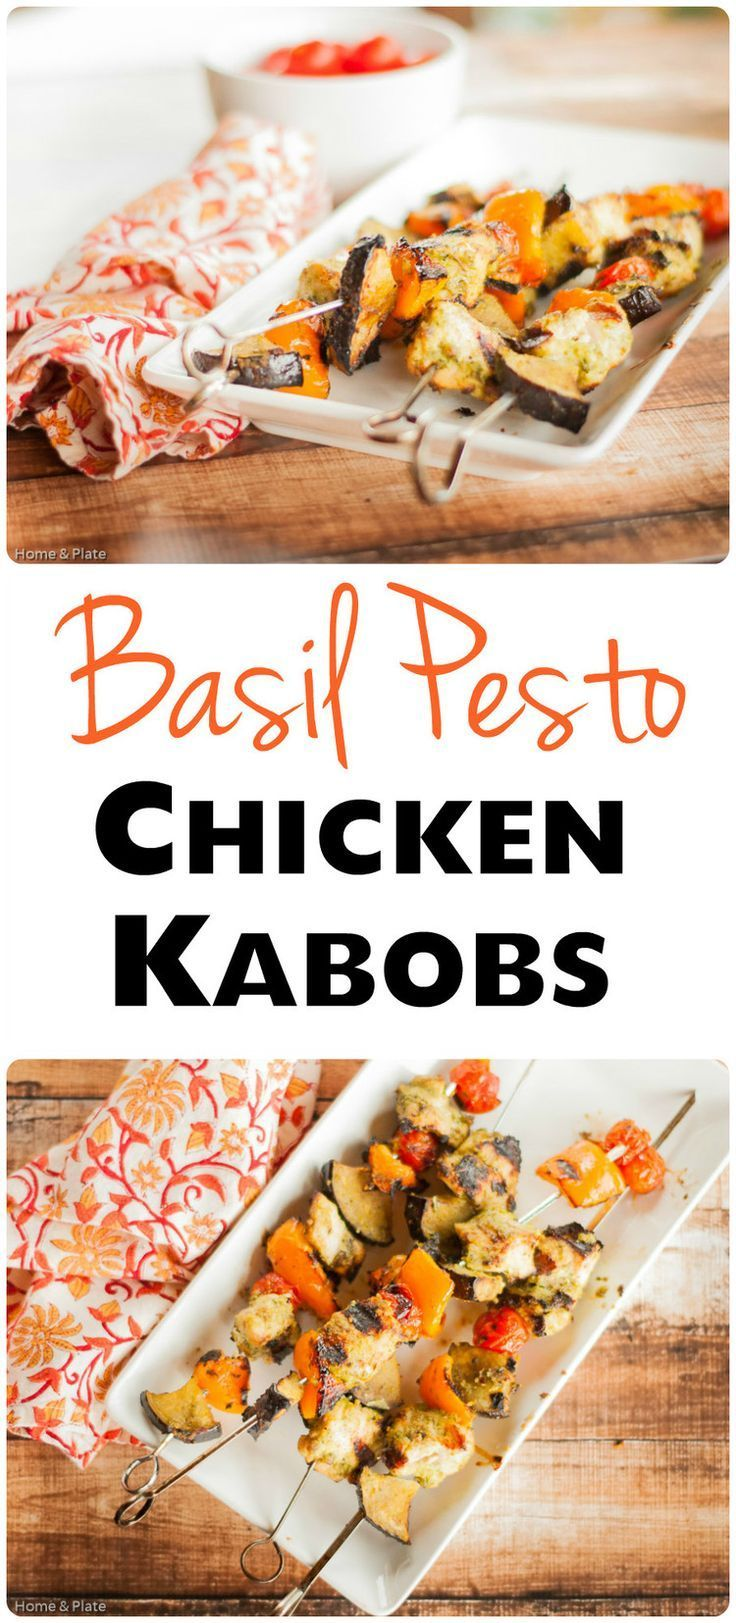 Basil Pesto Chicken Kebabs   Home & Plate   www.homeandplate.com   Basil. Pine nuts. Olive oil. Parmesan. Add it to chicken.Basil Pesto Chicken Kebabsare served!